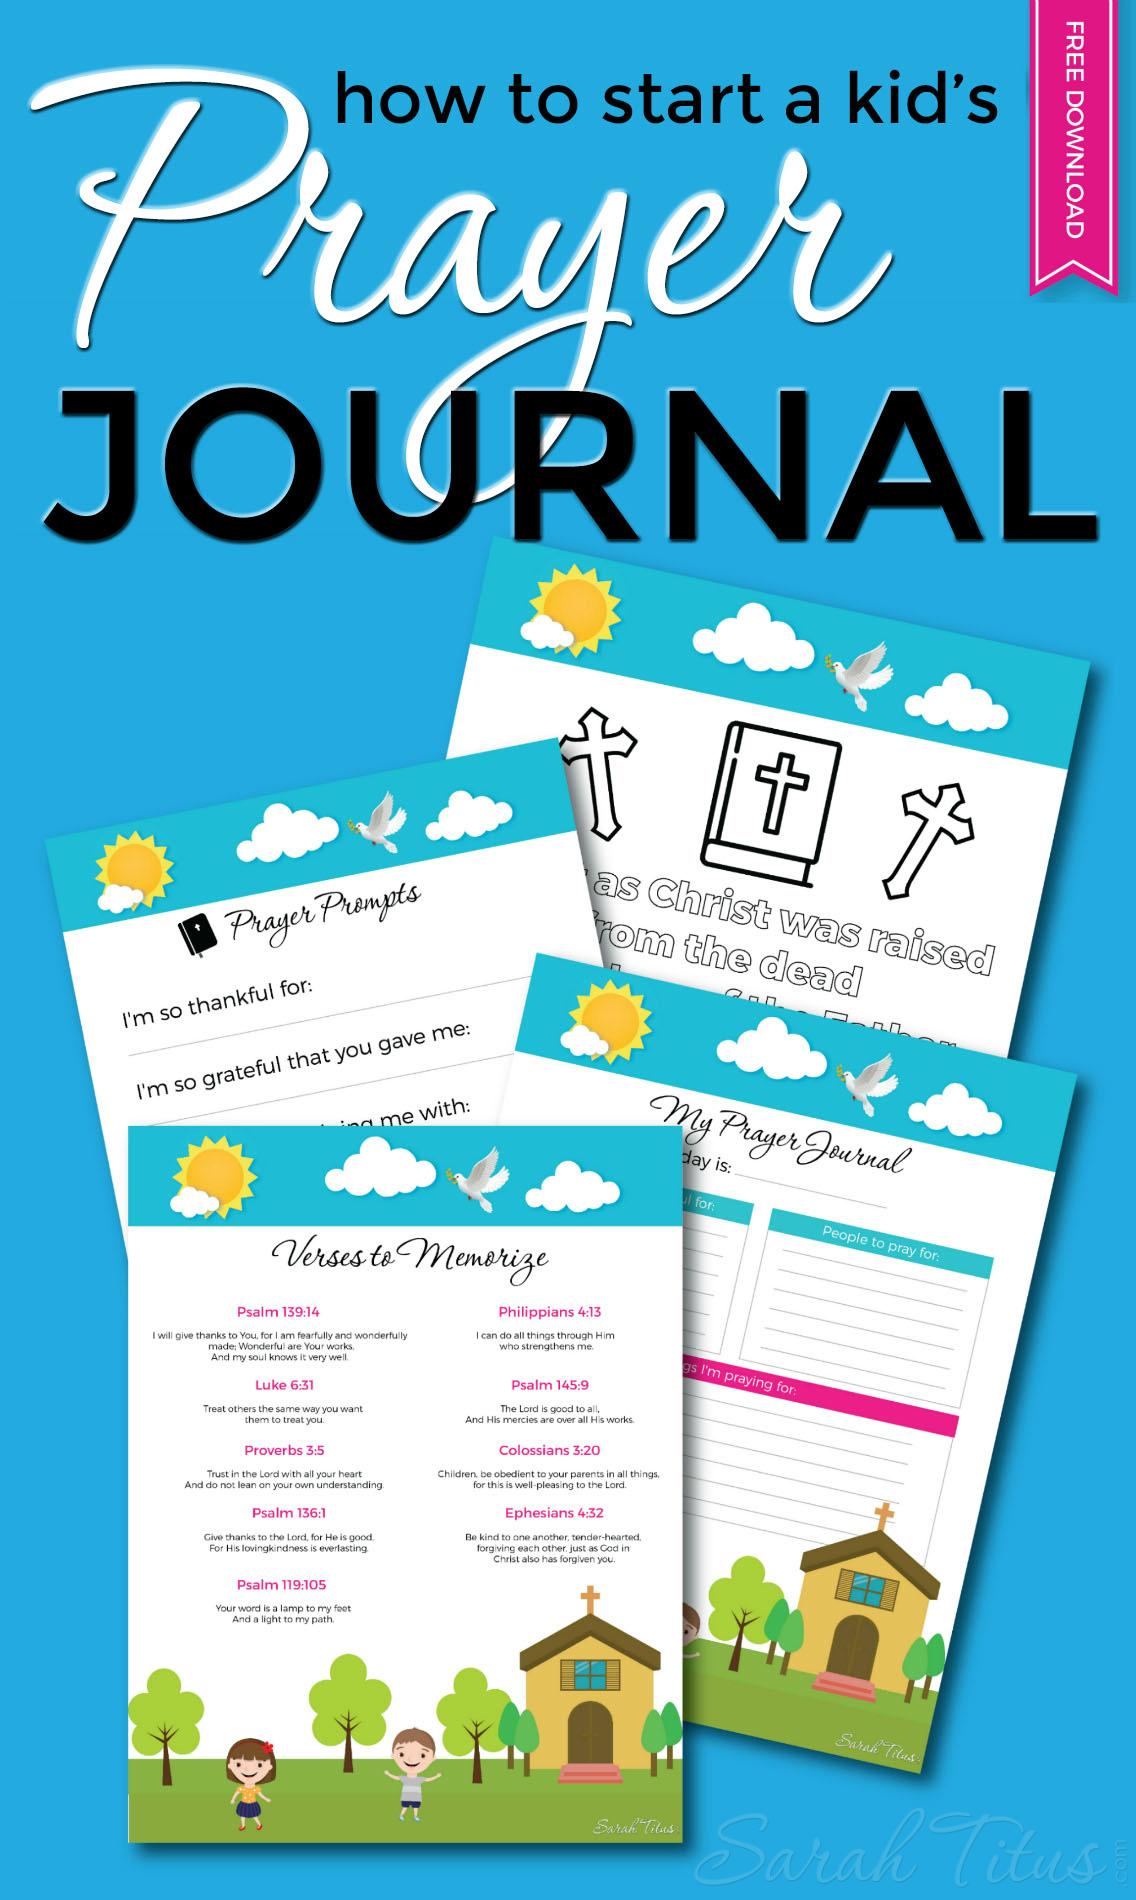 How To Start A Kid's Prayer Journal - Sarah Titus - Free Printable Prayer Journal